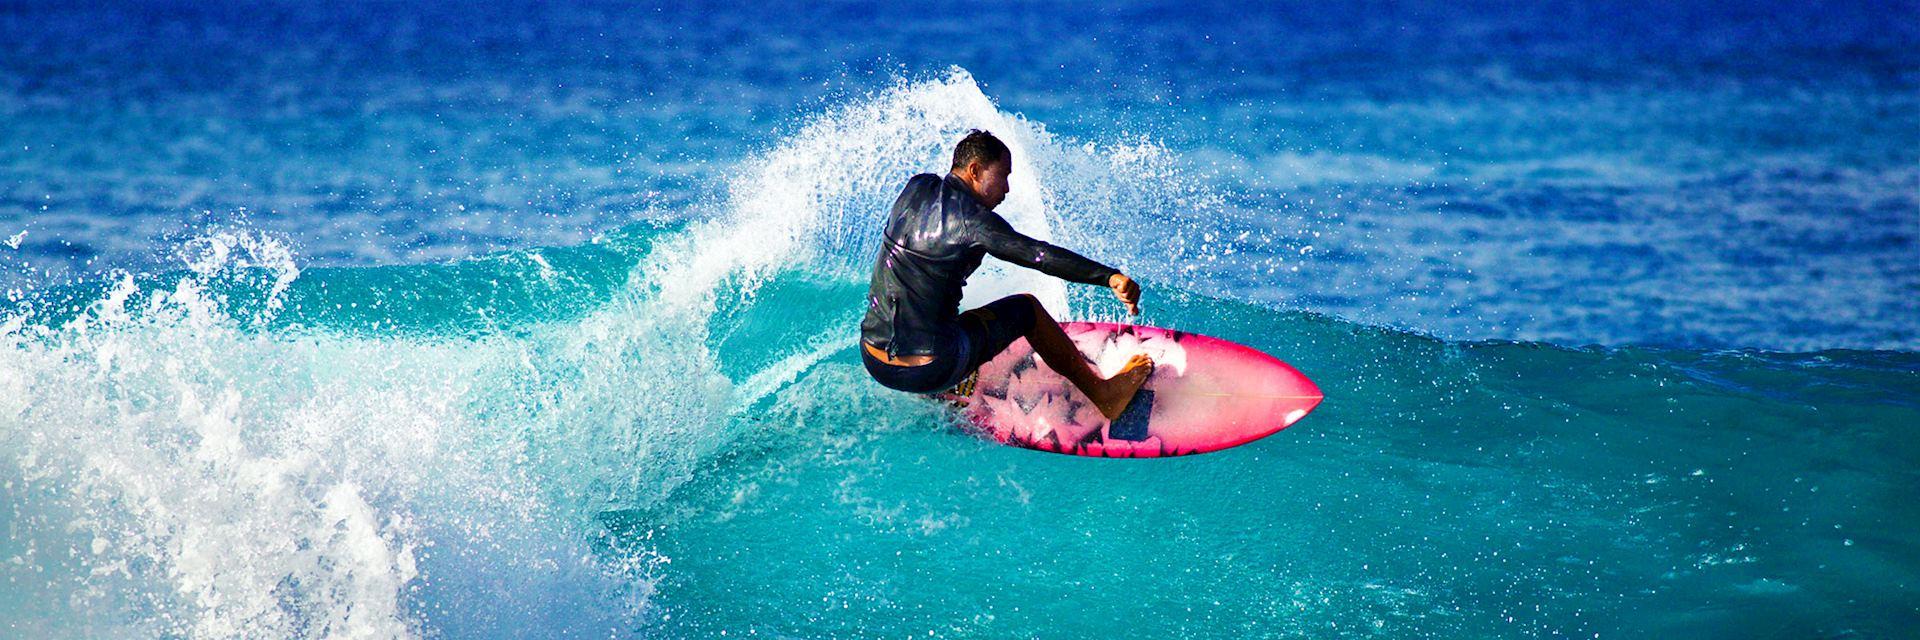 Surfer off the coast of Kauai, Hawaii